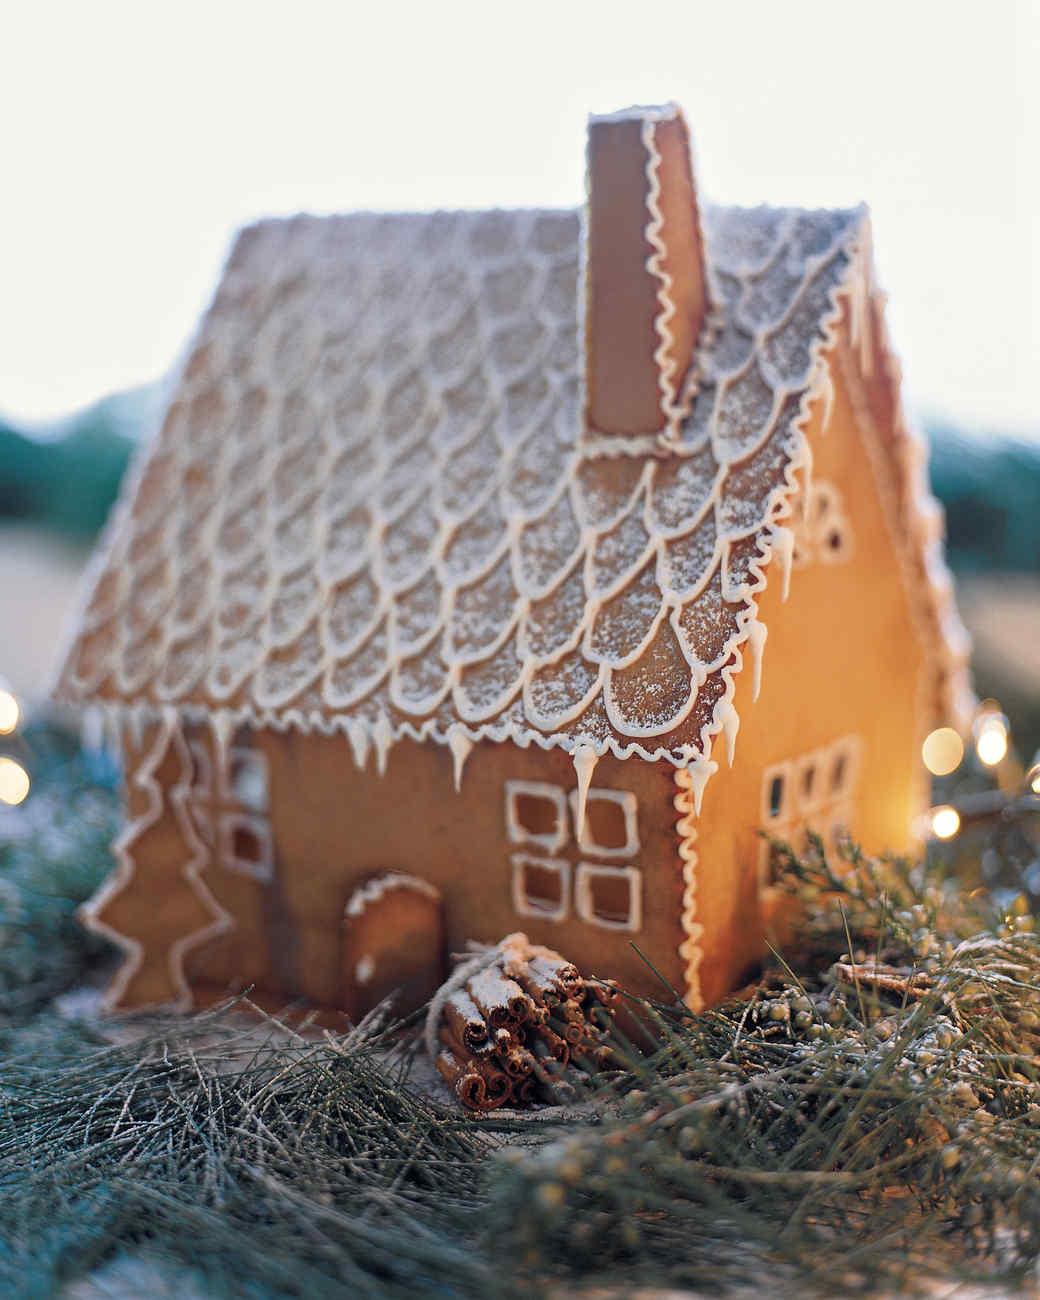 msl_hol09_gingerbread_house.jpg